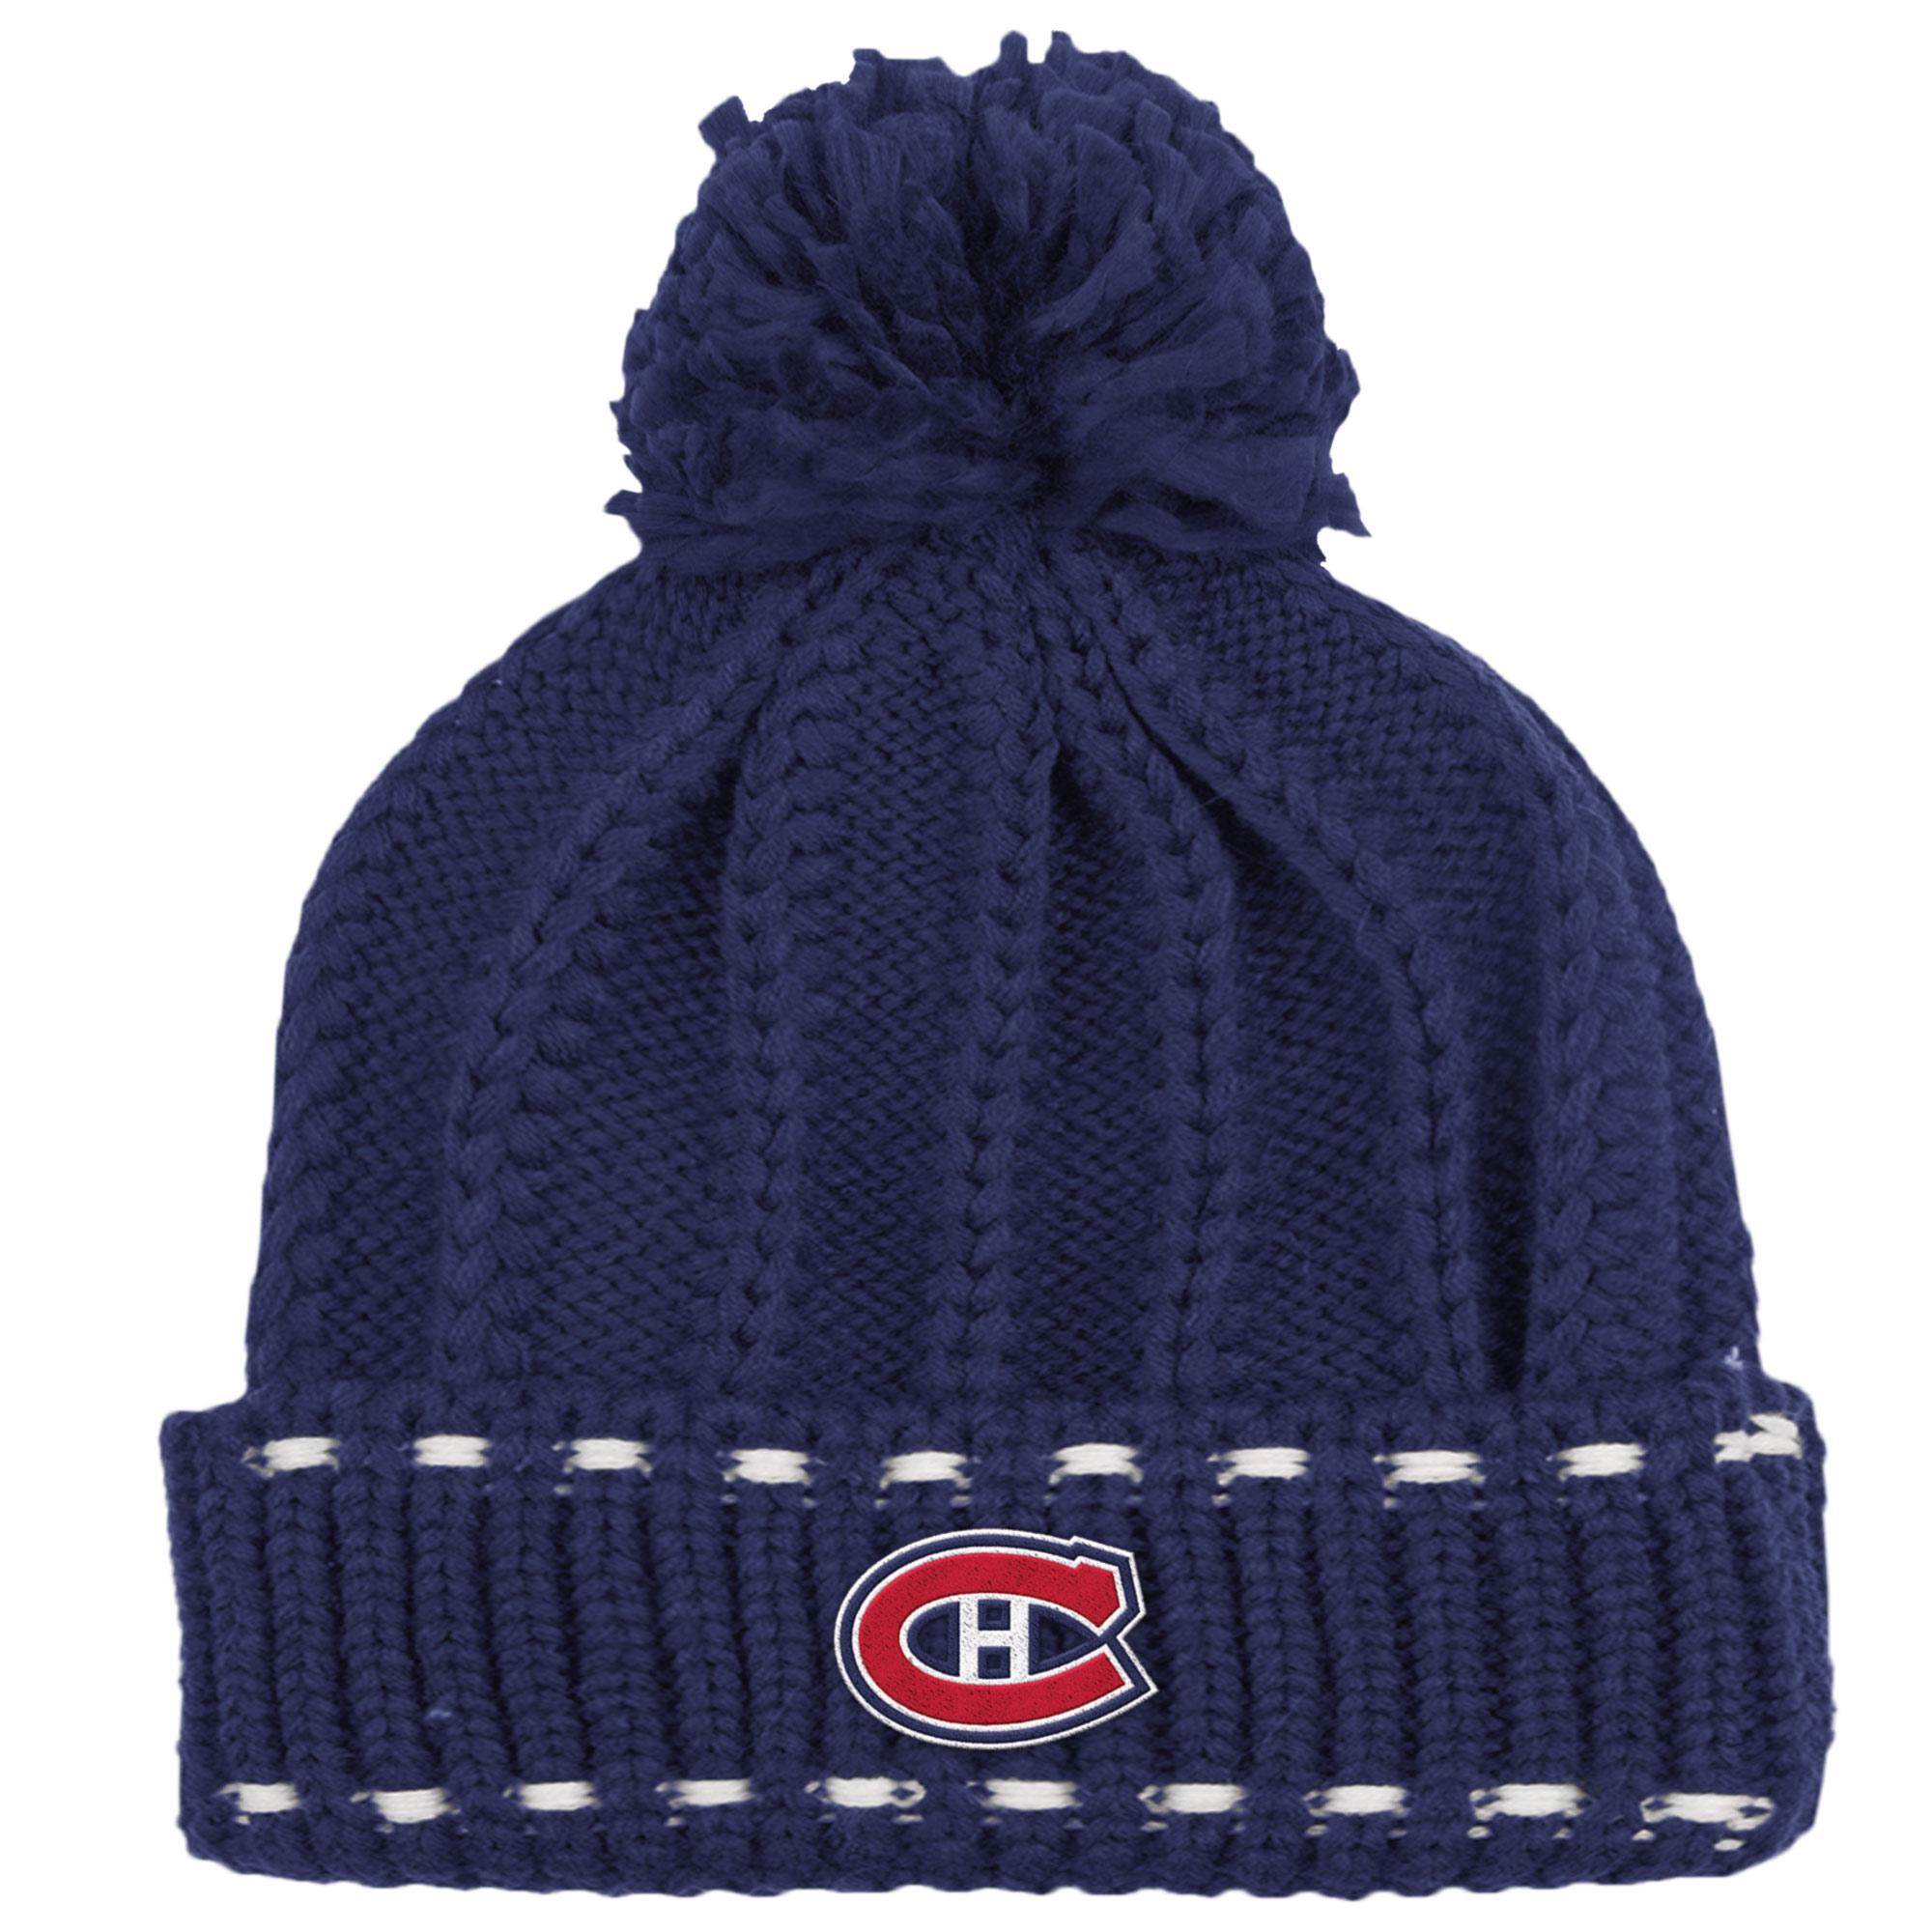 Montreal Canadiens Reebok Women's Cuffed Pom Knit Hat - Navy - OSFA